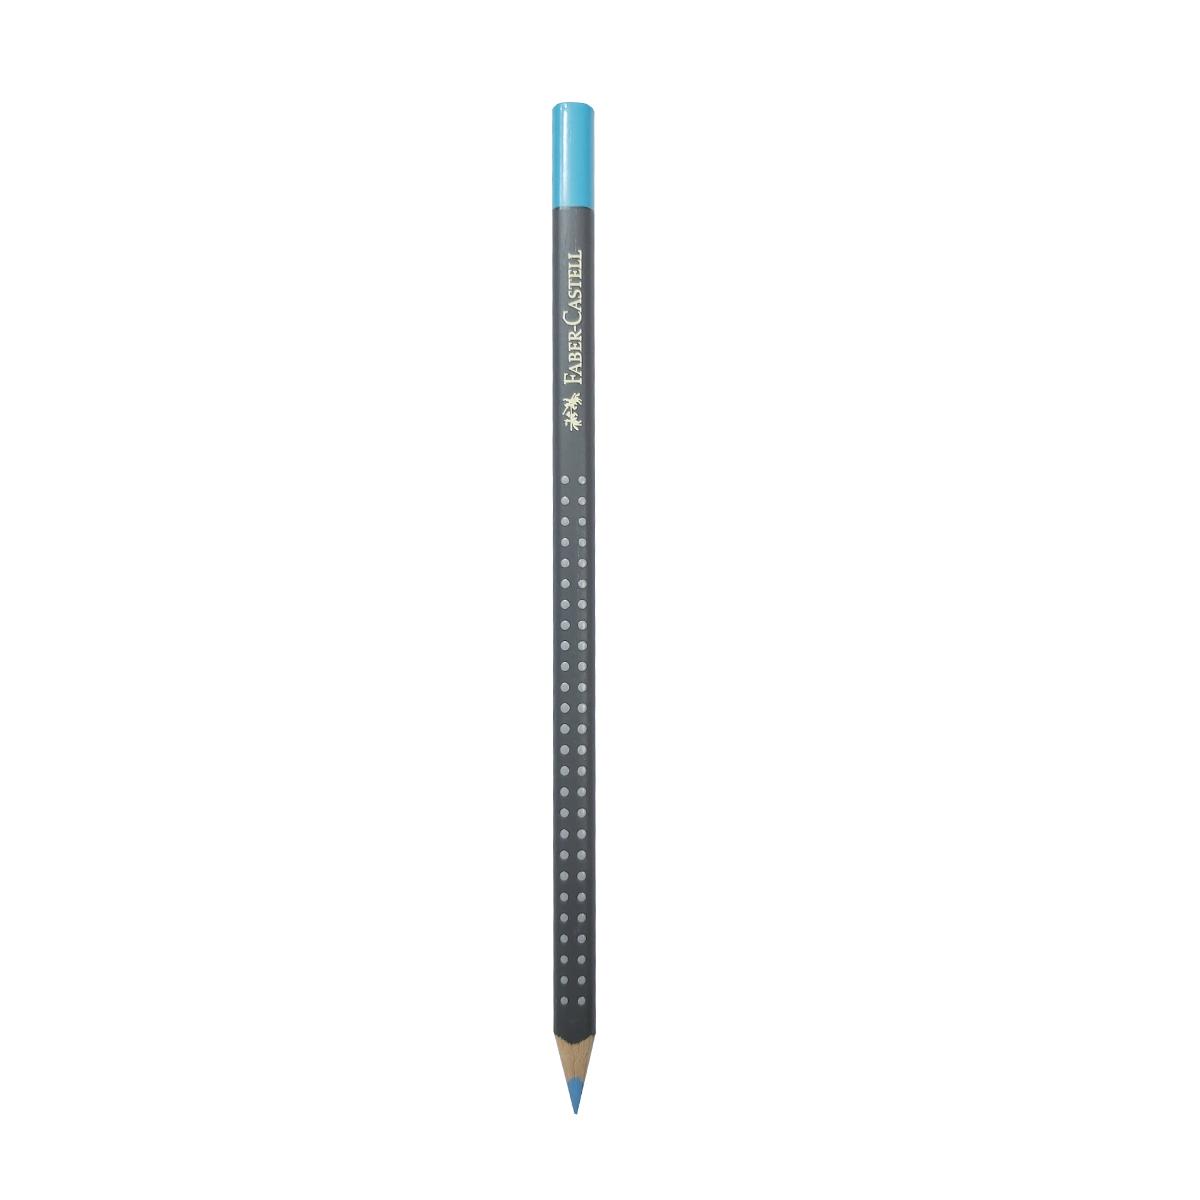 مداد رنگی فابر کاستل مدل آرت گریپ کد 147